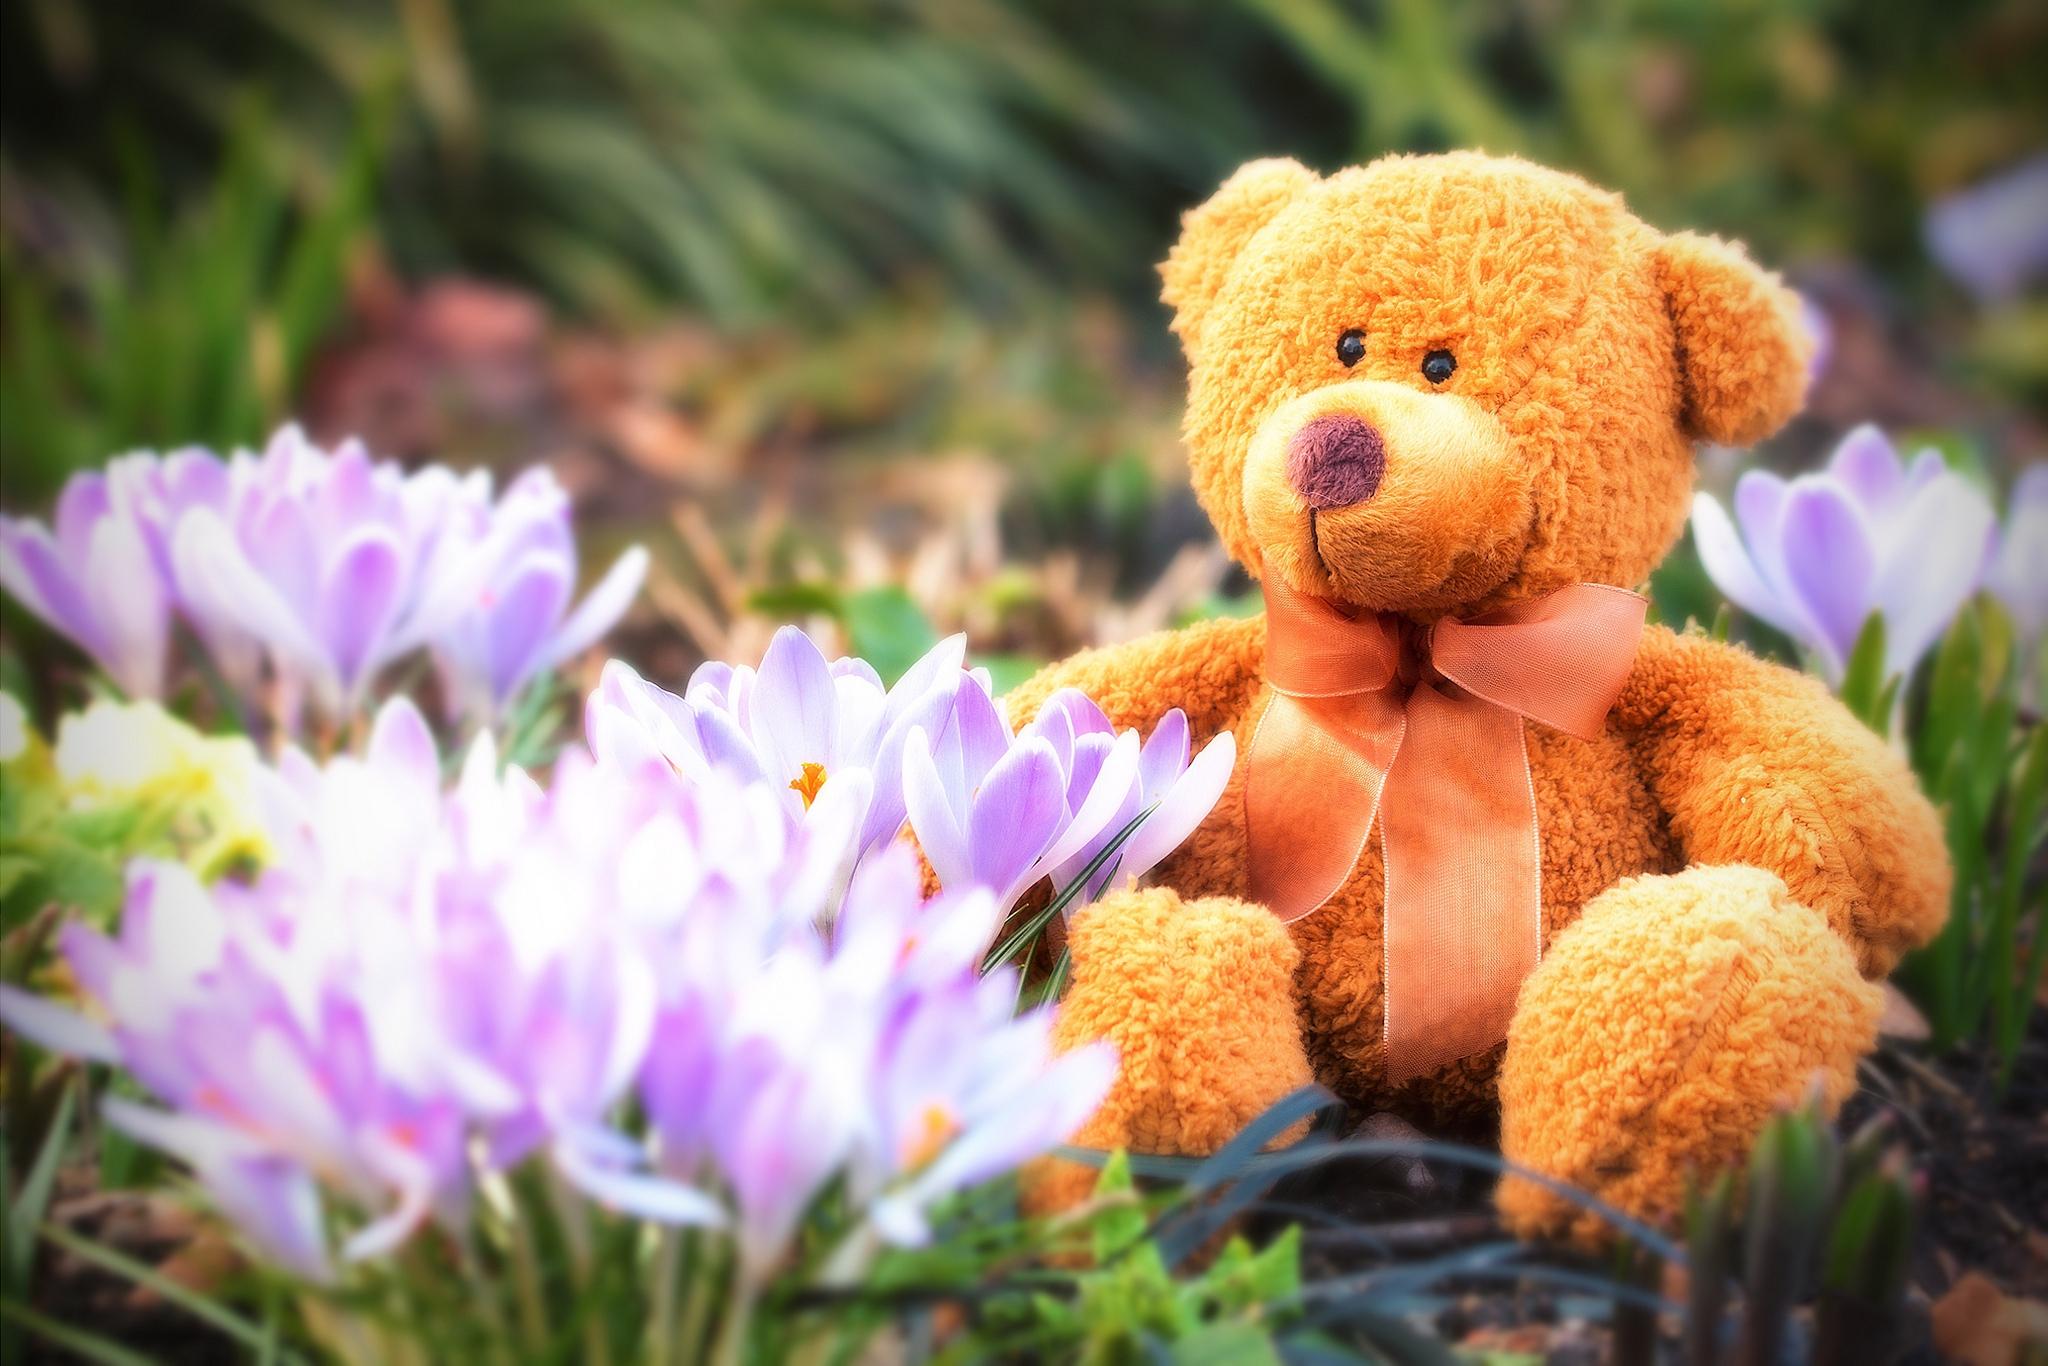 картинки цветочки и мишки денди или